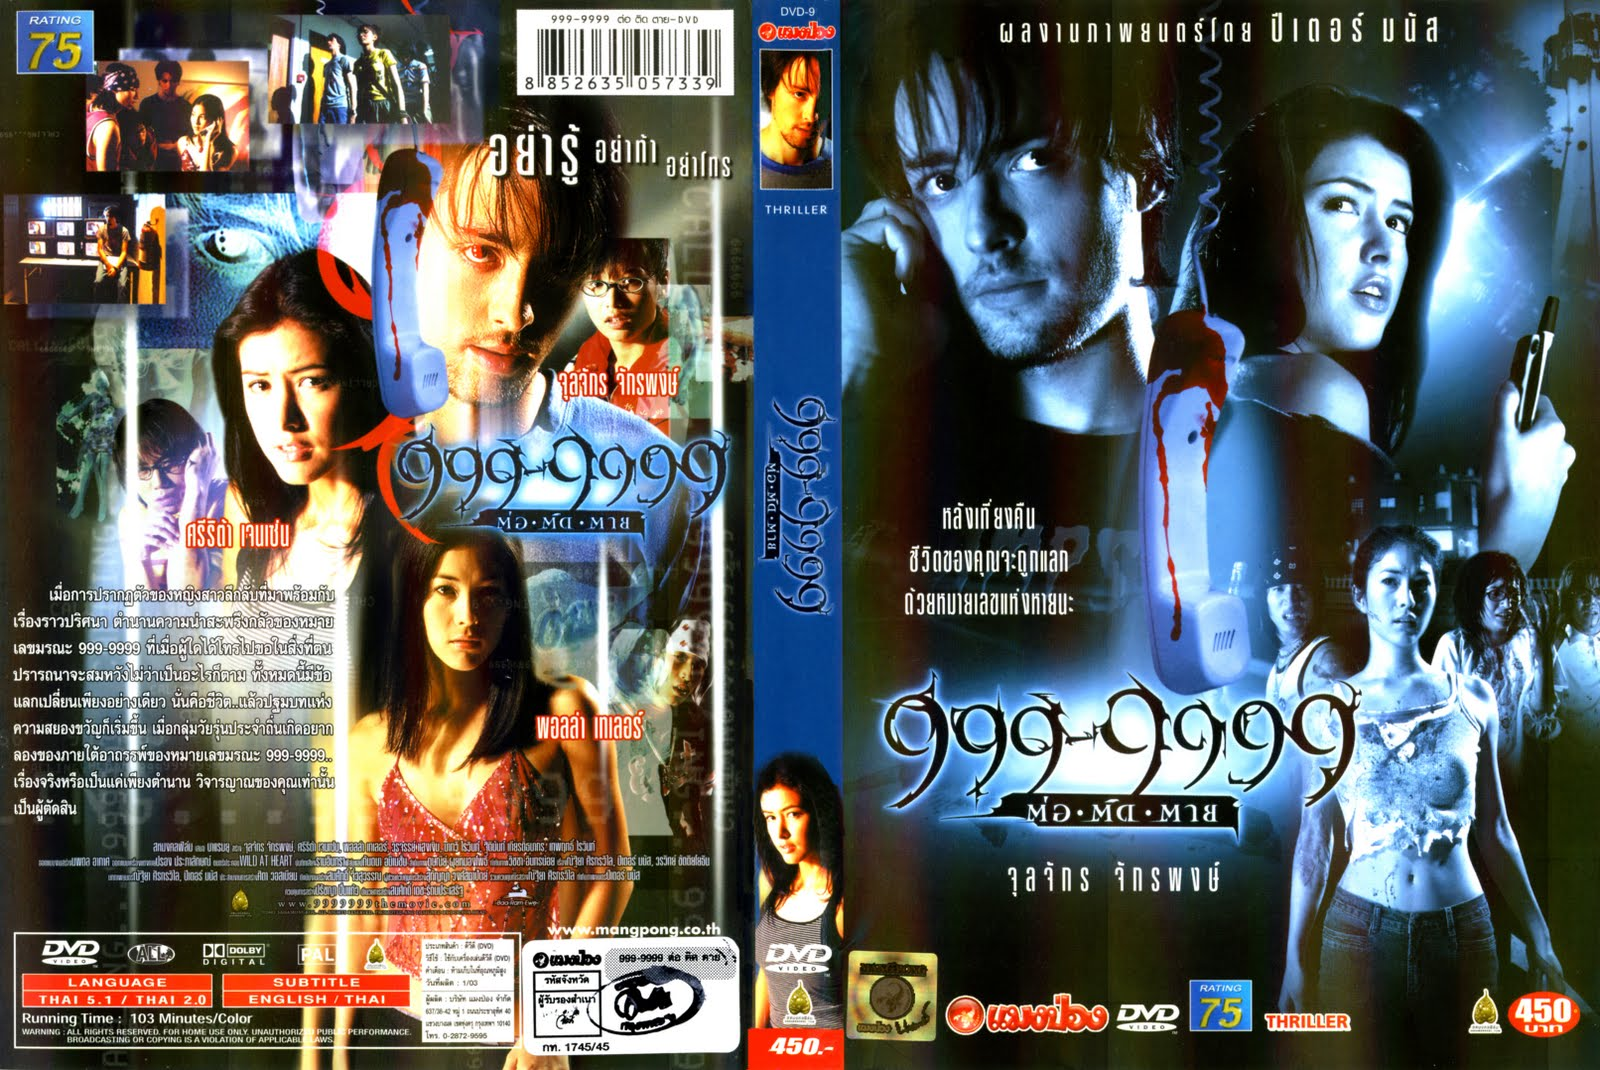 Evil phone 999-9999 ต่อติดตาย (2002)